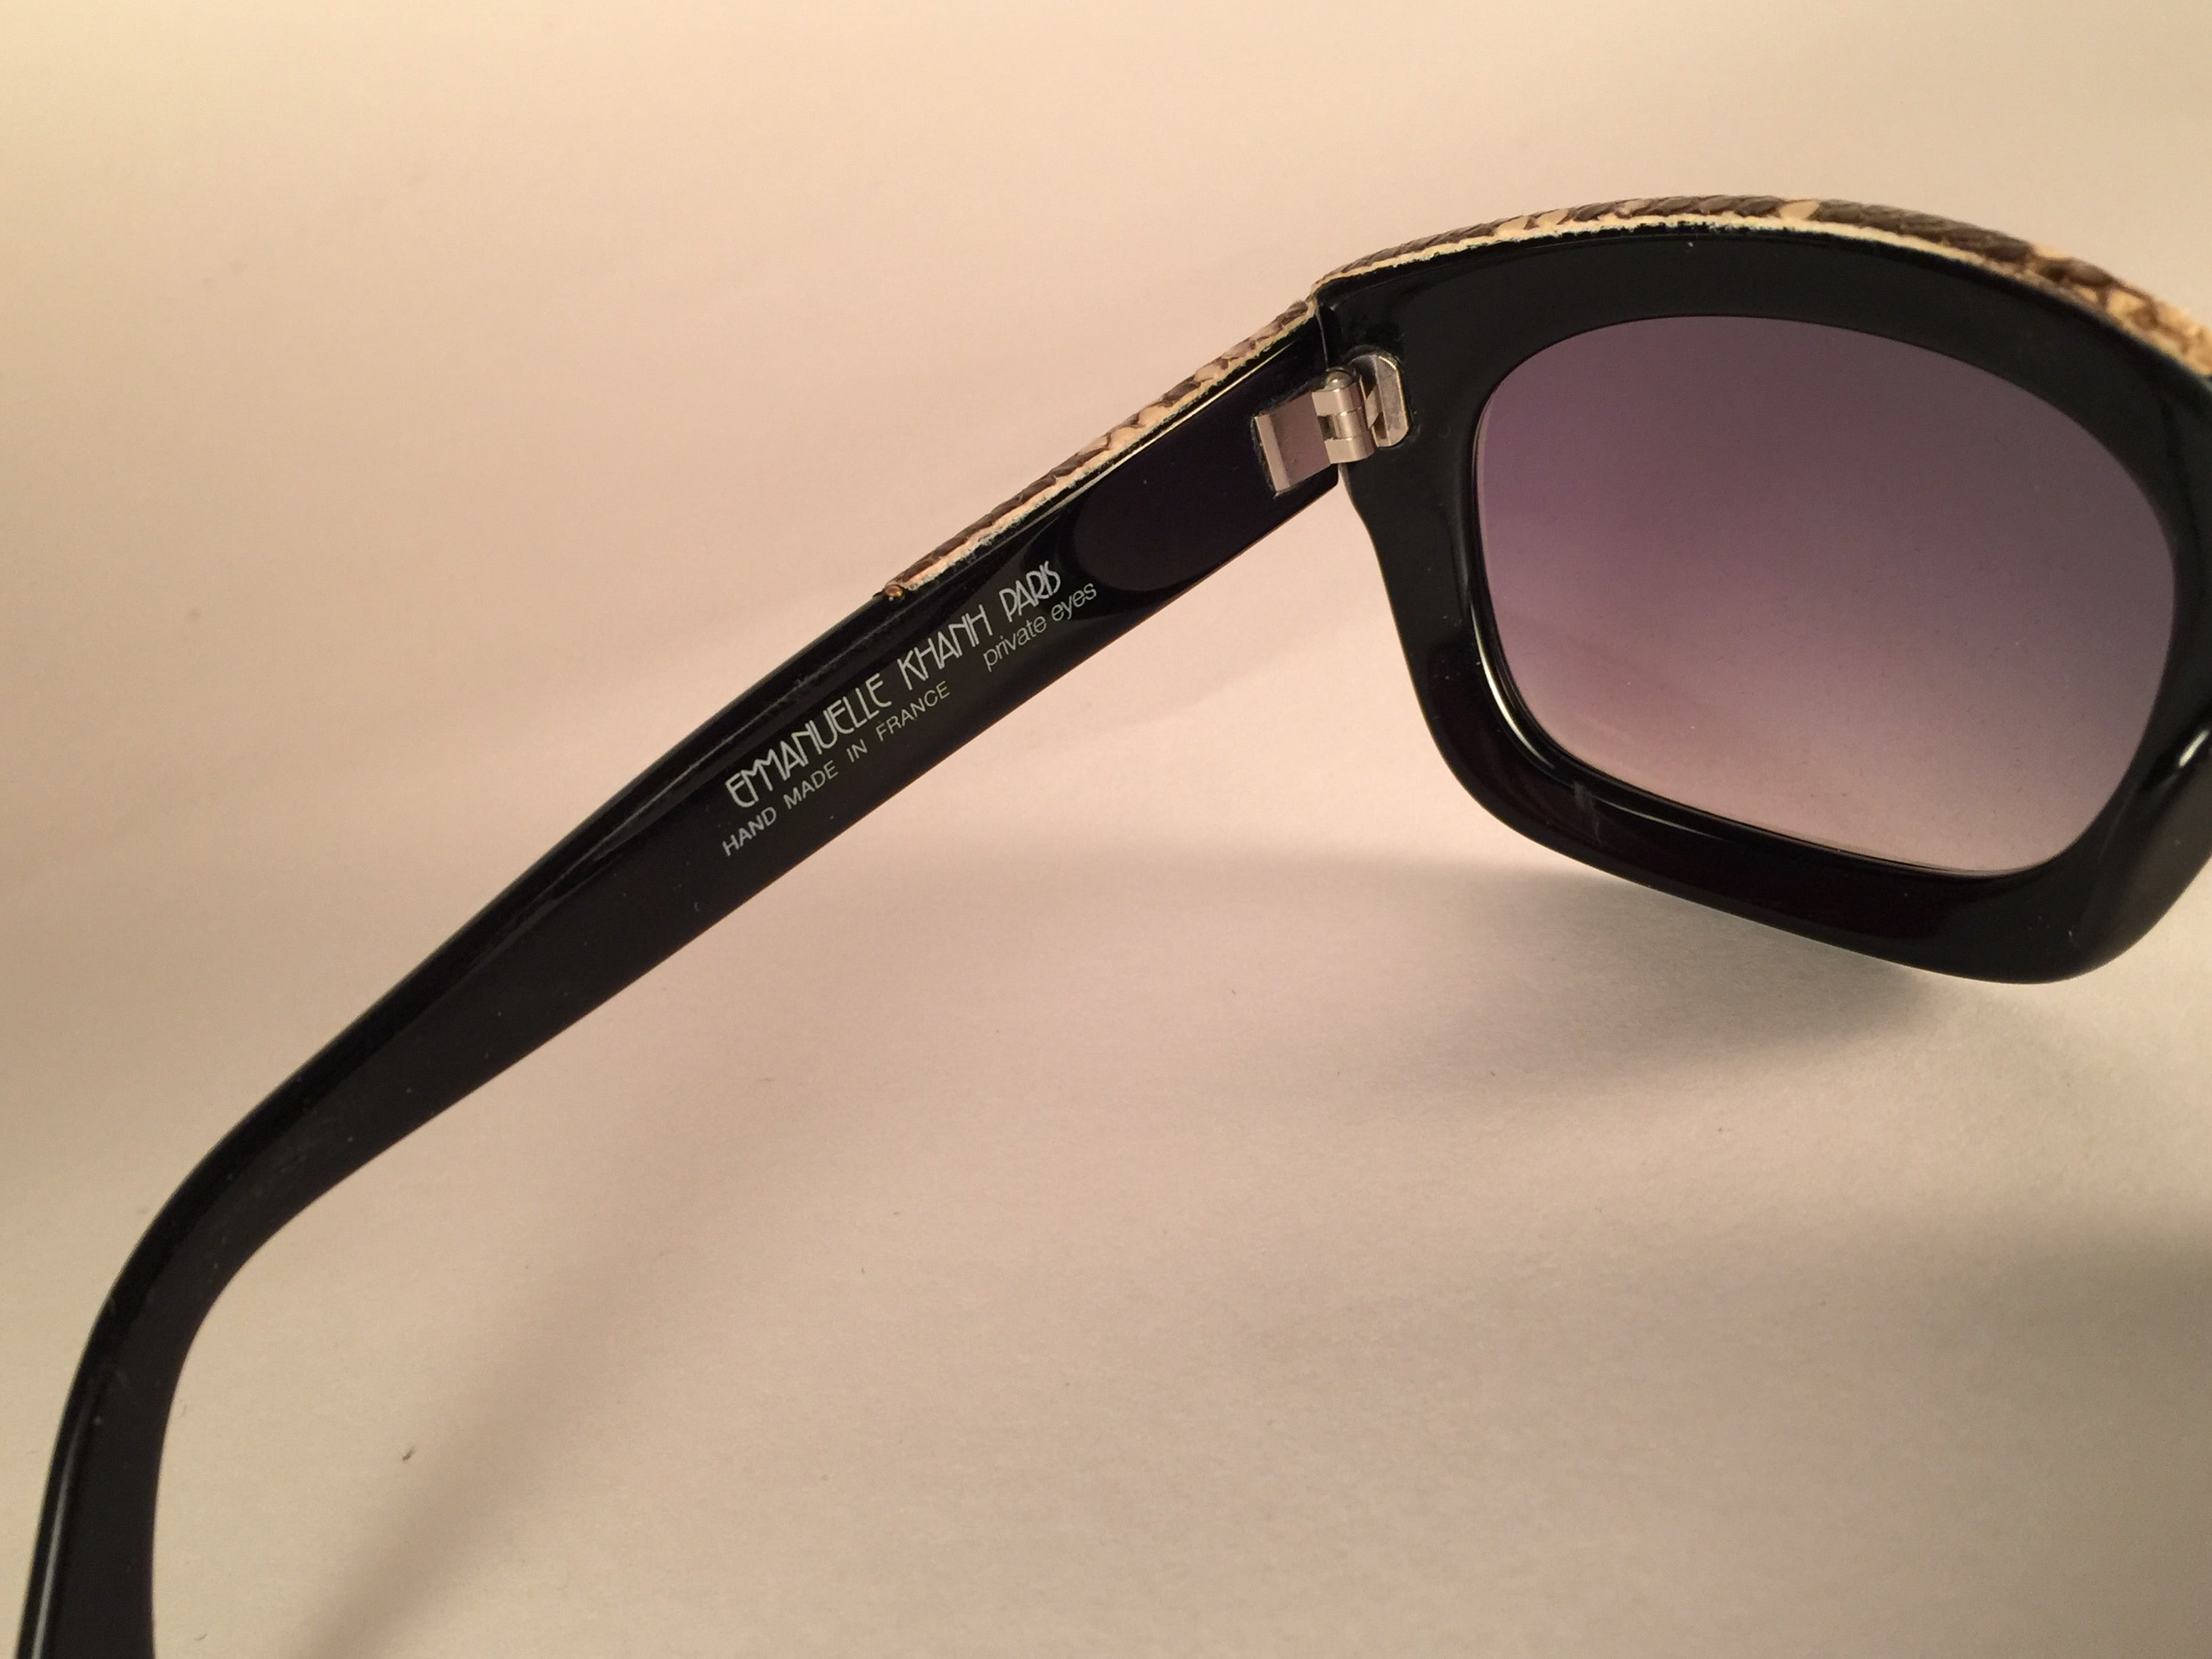 f7f0388f23c New vintage emanuelle kahn paris genuine python and black sunglasses france  at stdibs jpg 3264x2448 Emmanuel